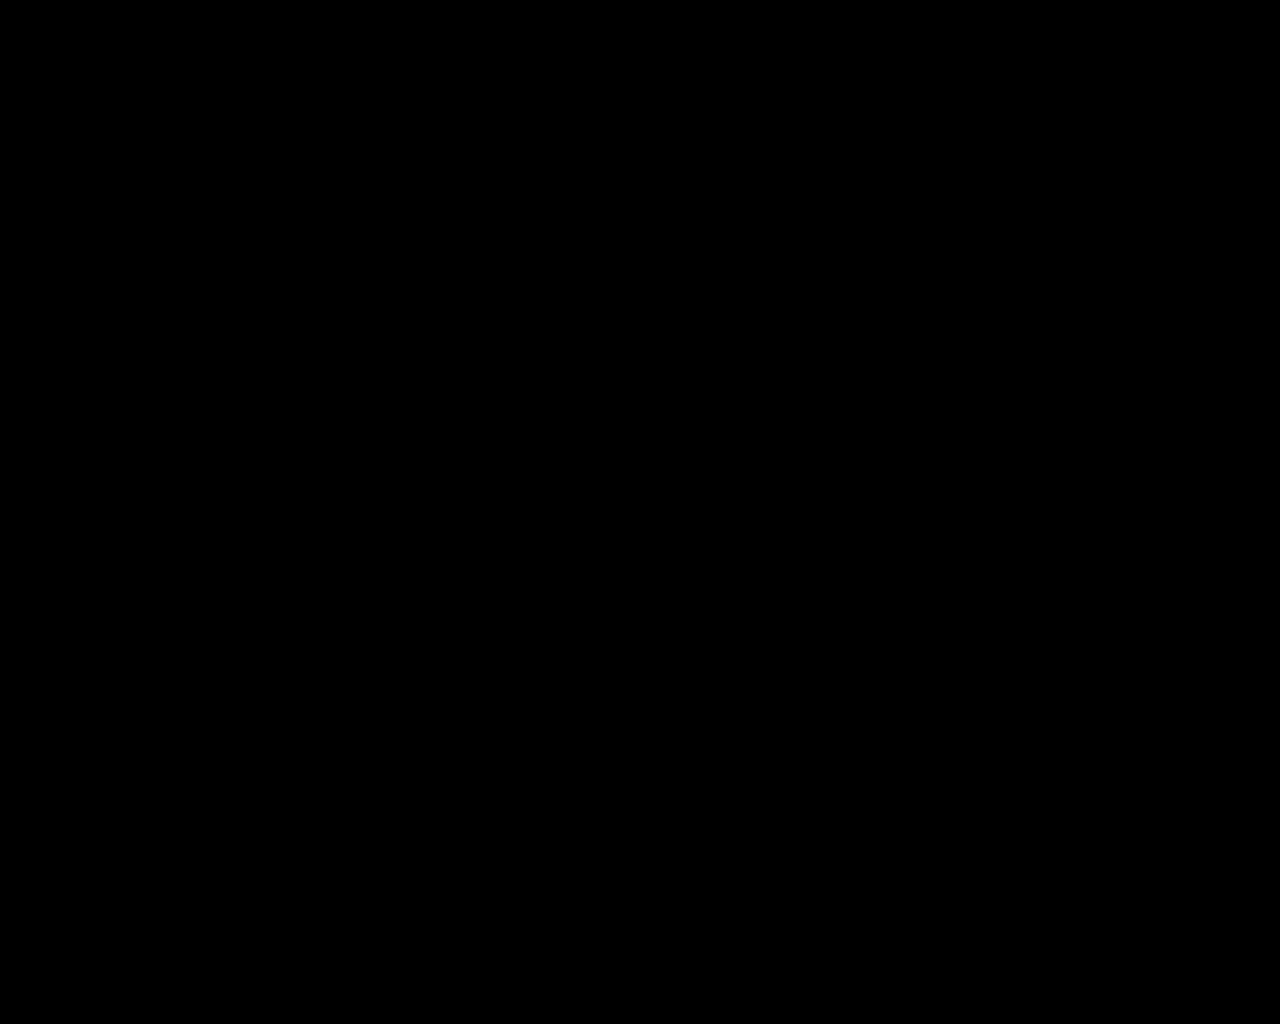 DE_1280